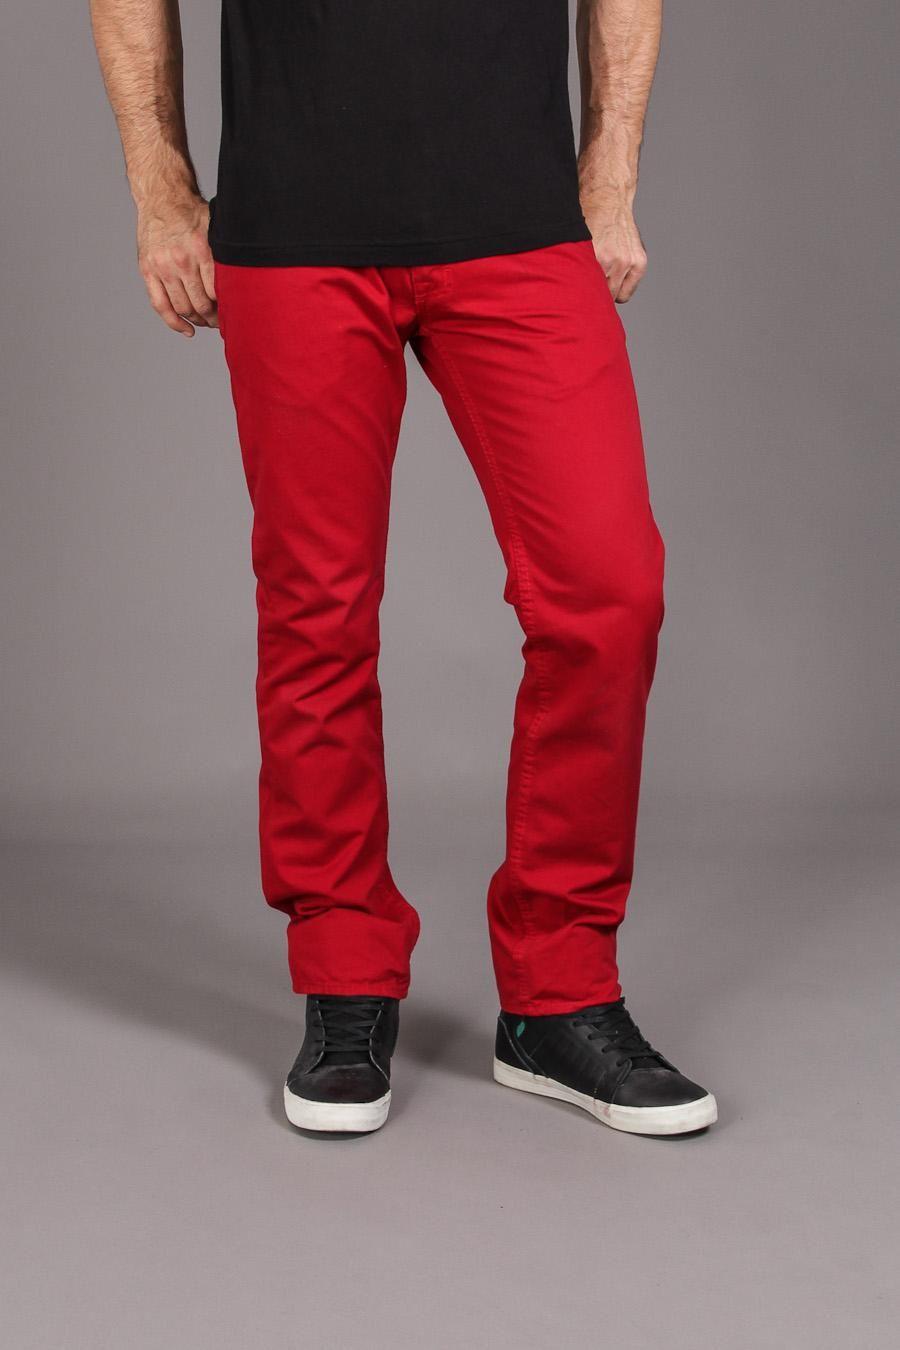 Jordan Craig Slim Fit 5 Pocket Pant   Add a color to your wardrobe.